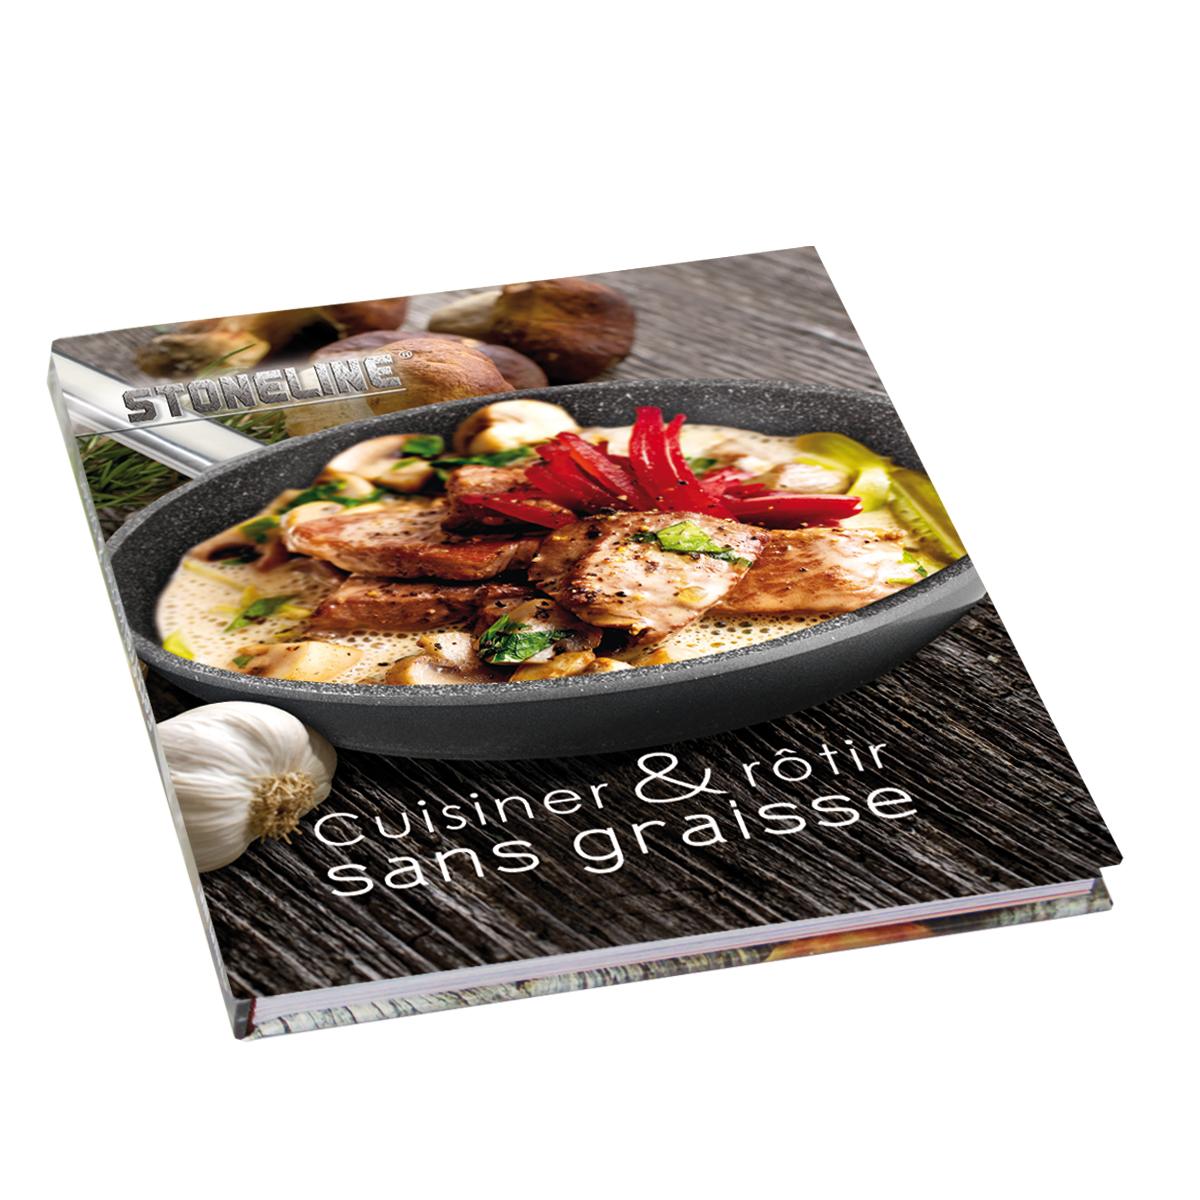 livre de cuisine stoneline